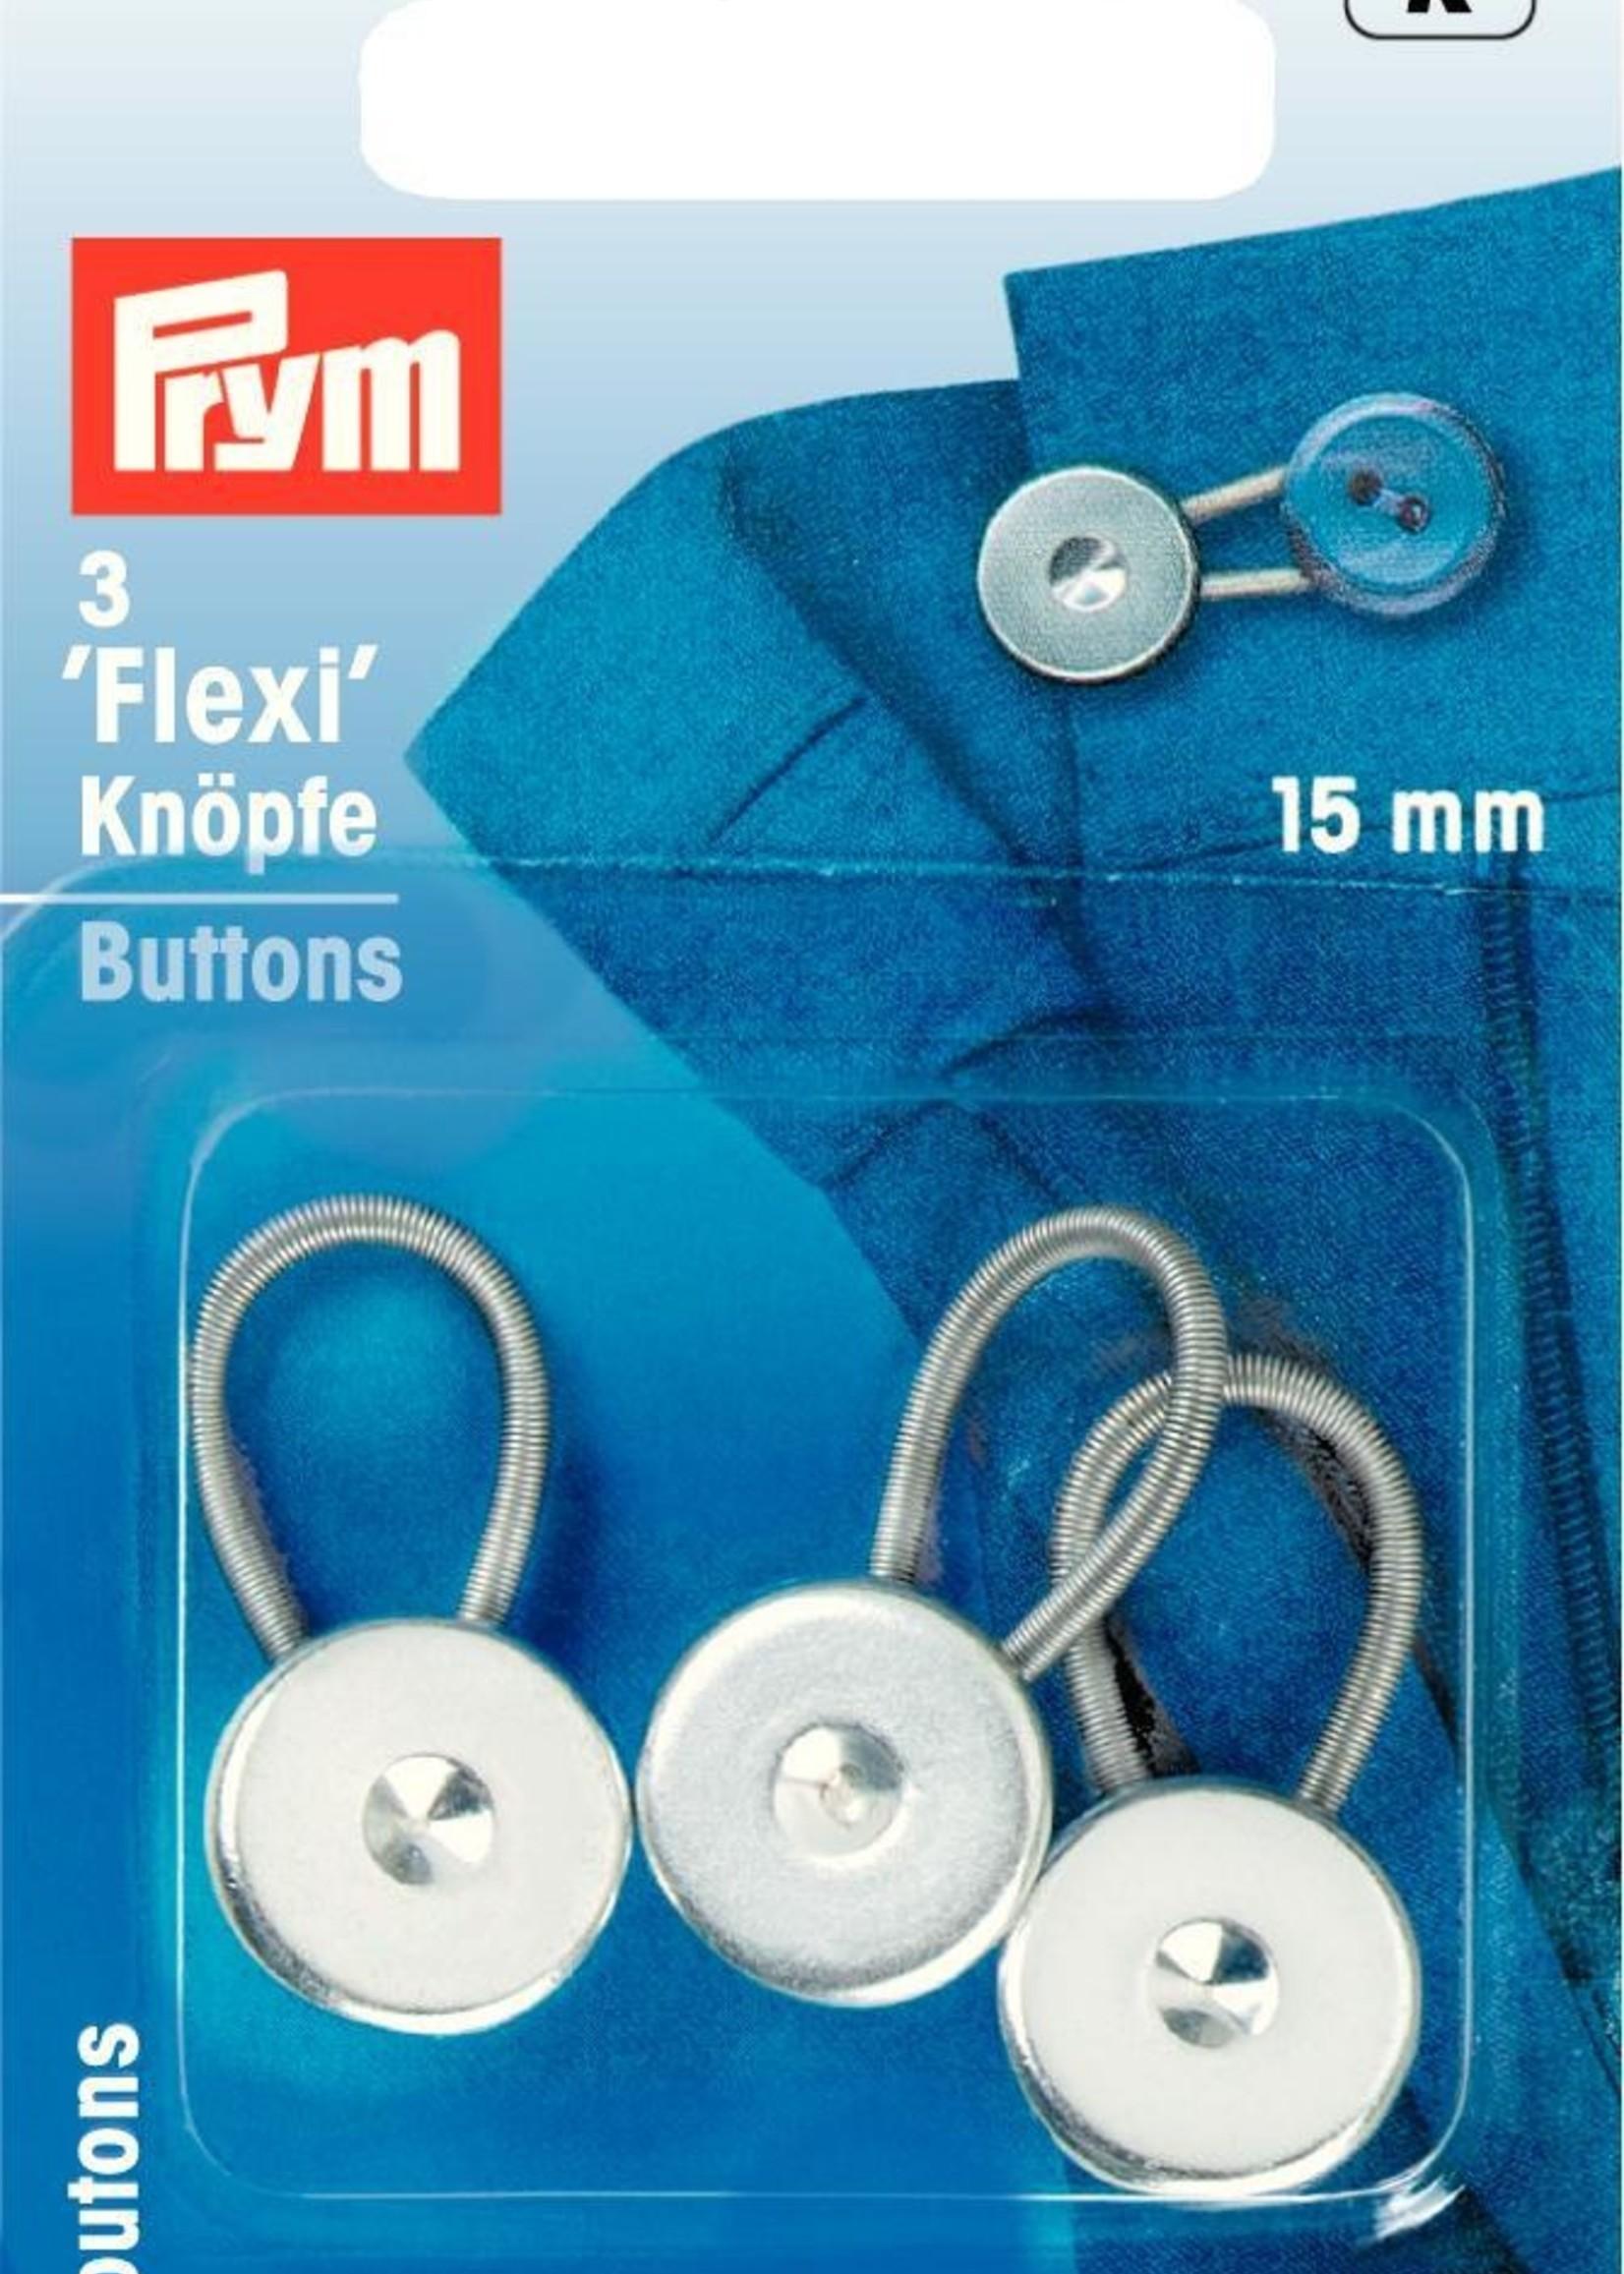 Prym Knoopverlenger Prym 15mm